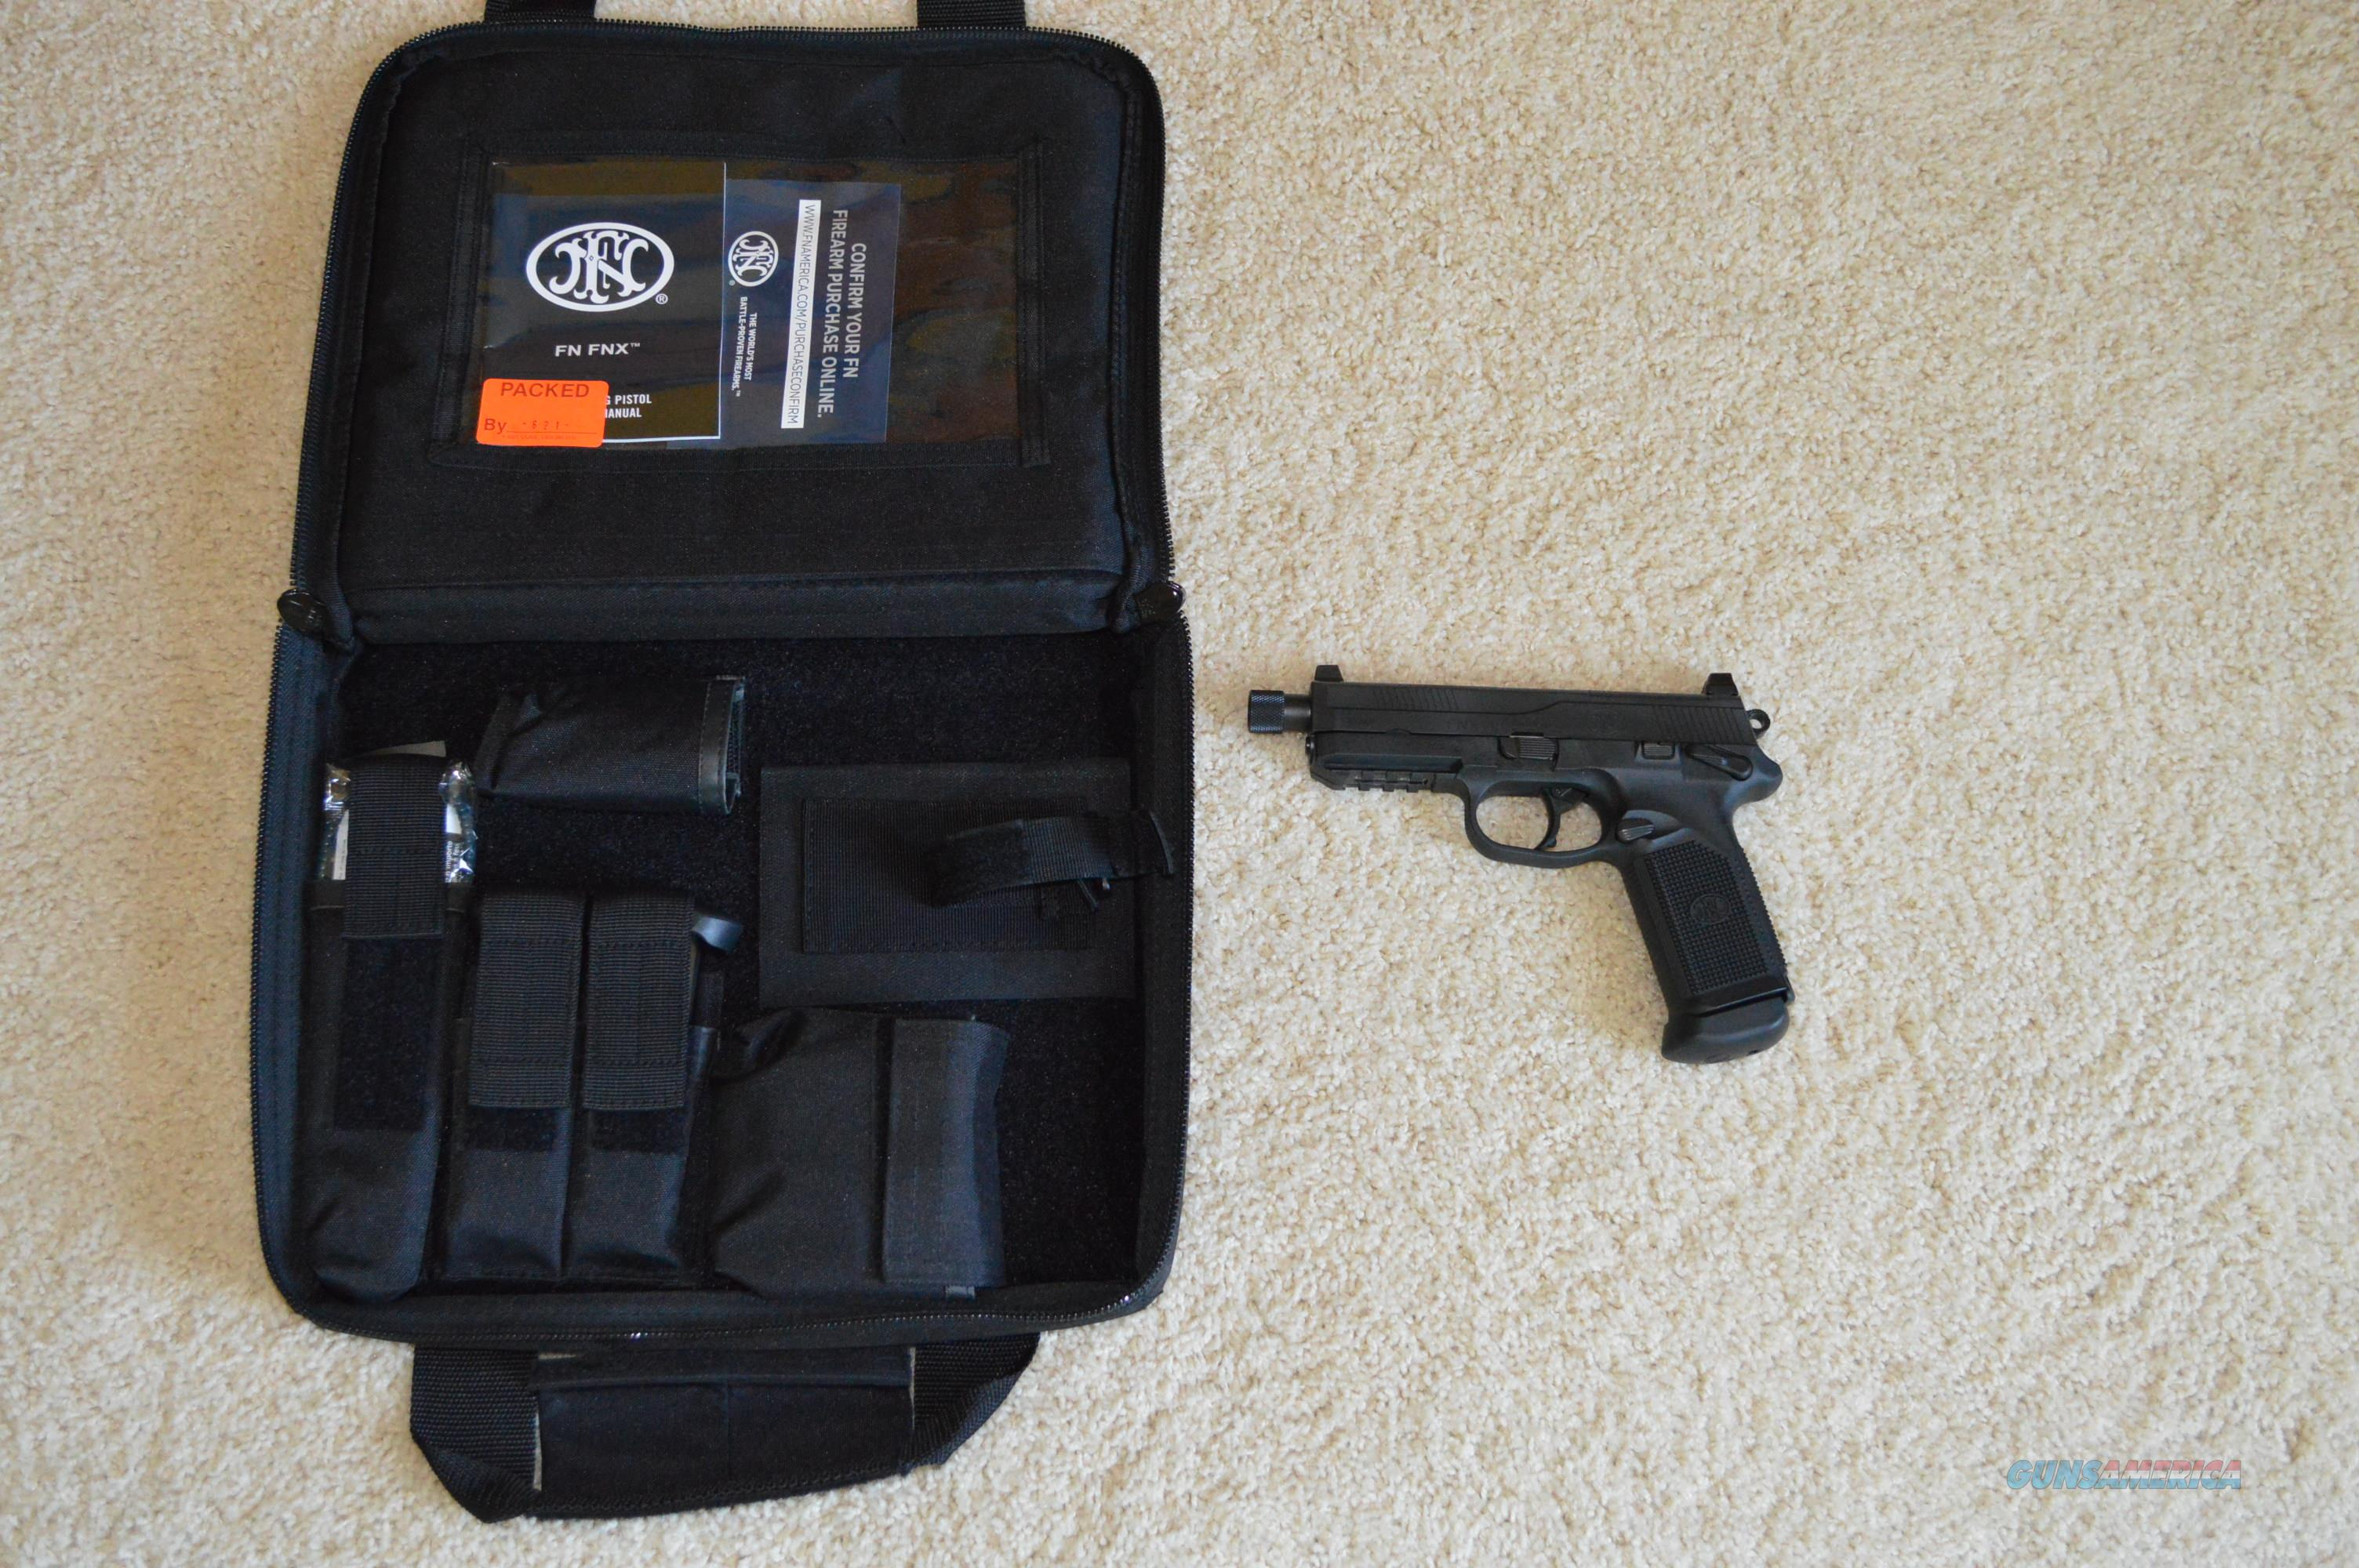 FN FNX-45 Tactical Black FREE SHIP NO CC FEE!  Guns > Pistols > FNH - Fabrique Nationale (FN) Pistols > FNX